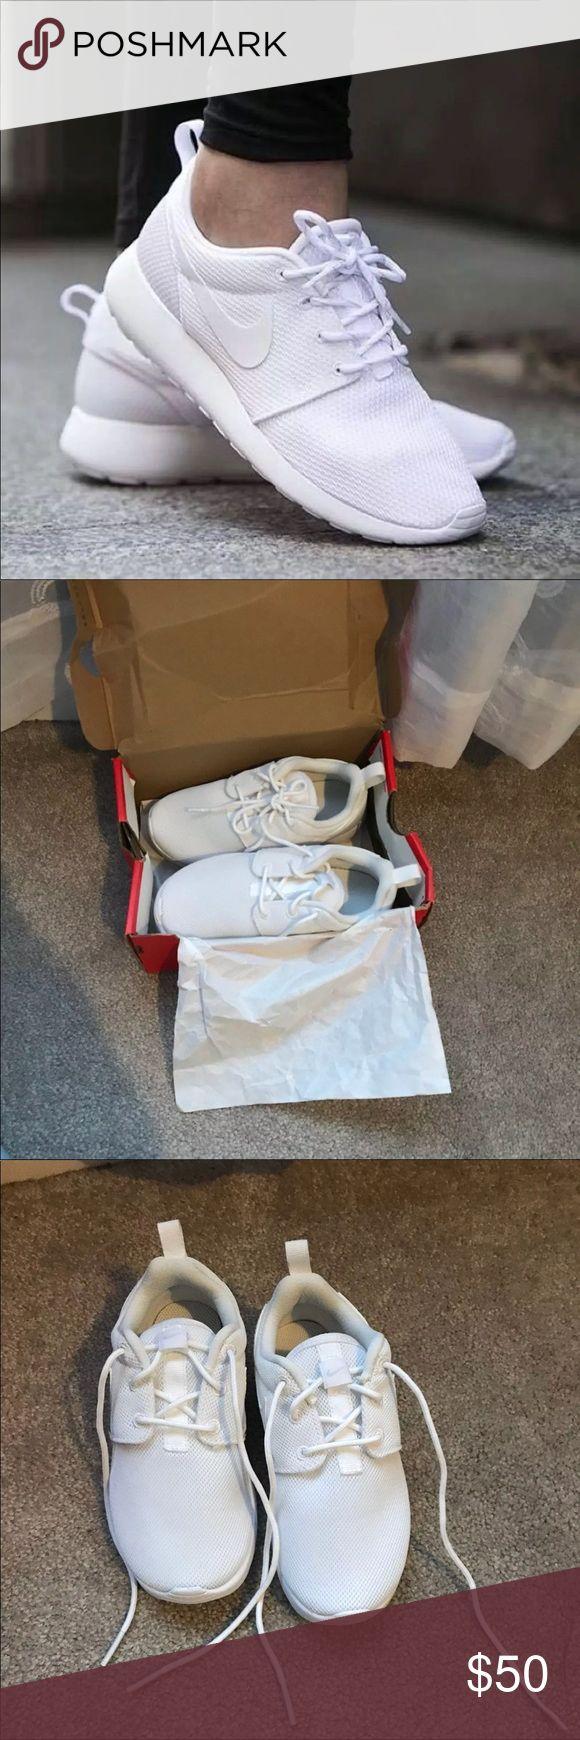 NIKE KIDS ALL WHITE ROSHE RUNS NIKE ROSHE RUN ALL WHITE SIZE KIDS 12 NIKE 12C NEVER WORN PURCHASED THE WRONG SIZE also sold on merc!! Nike Shoes Sneakers